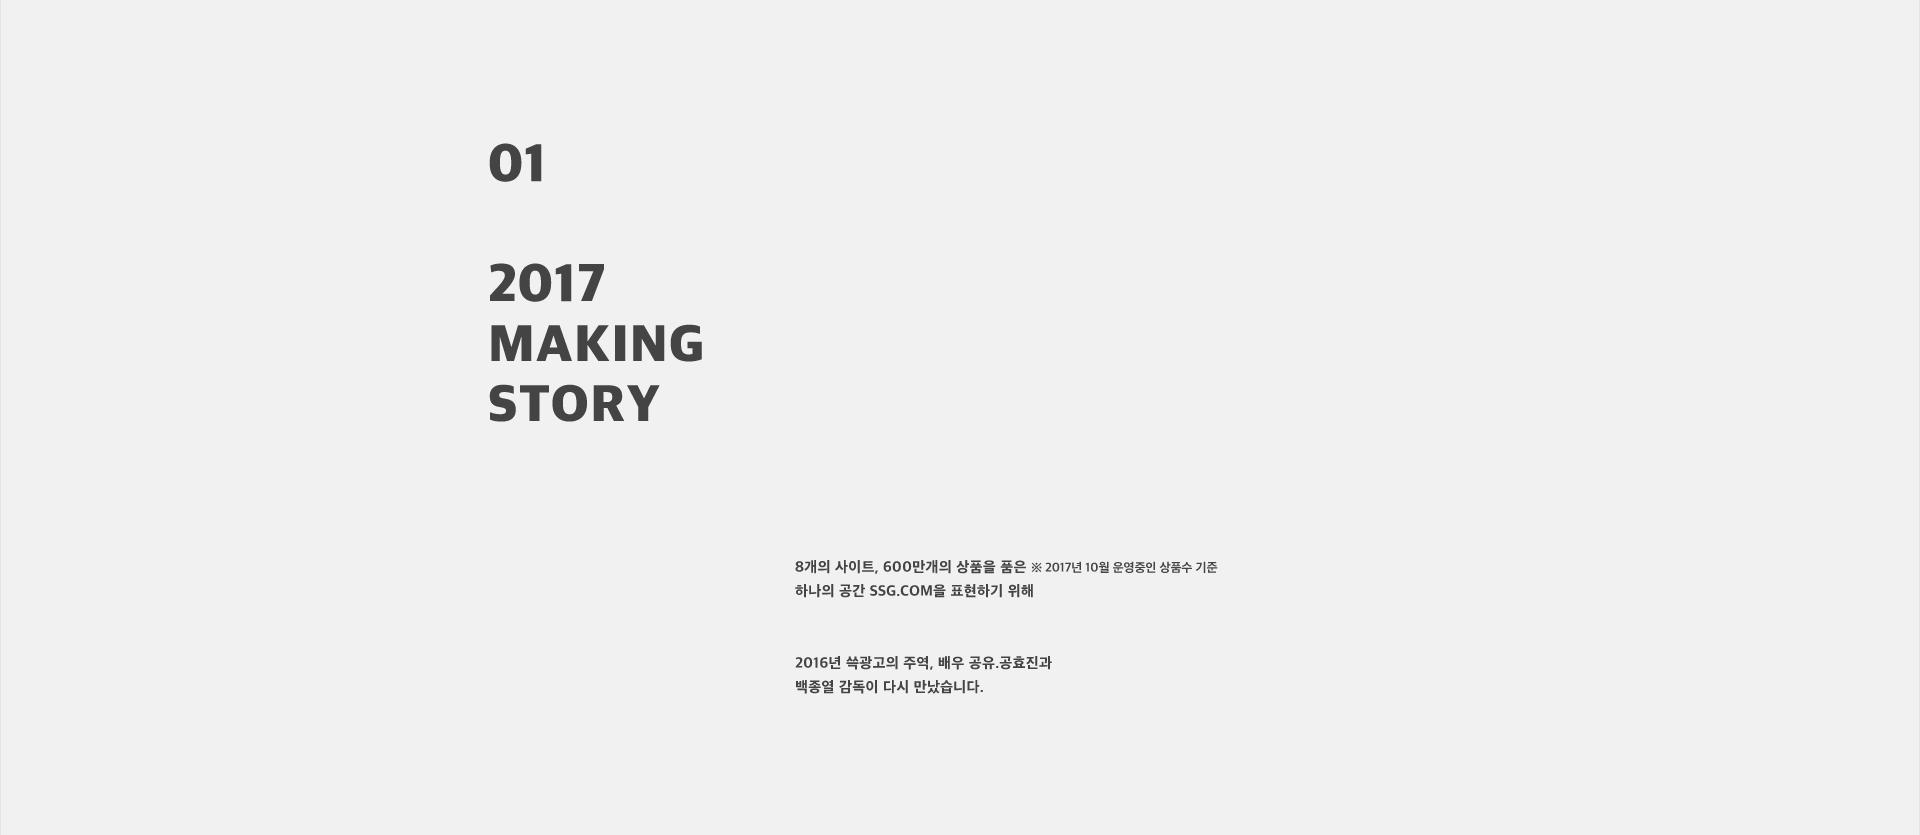 01. 2017 Making Story, 상세내용 다음 참조